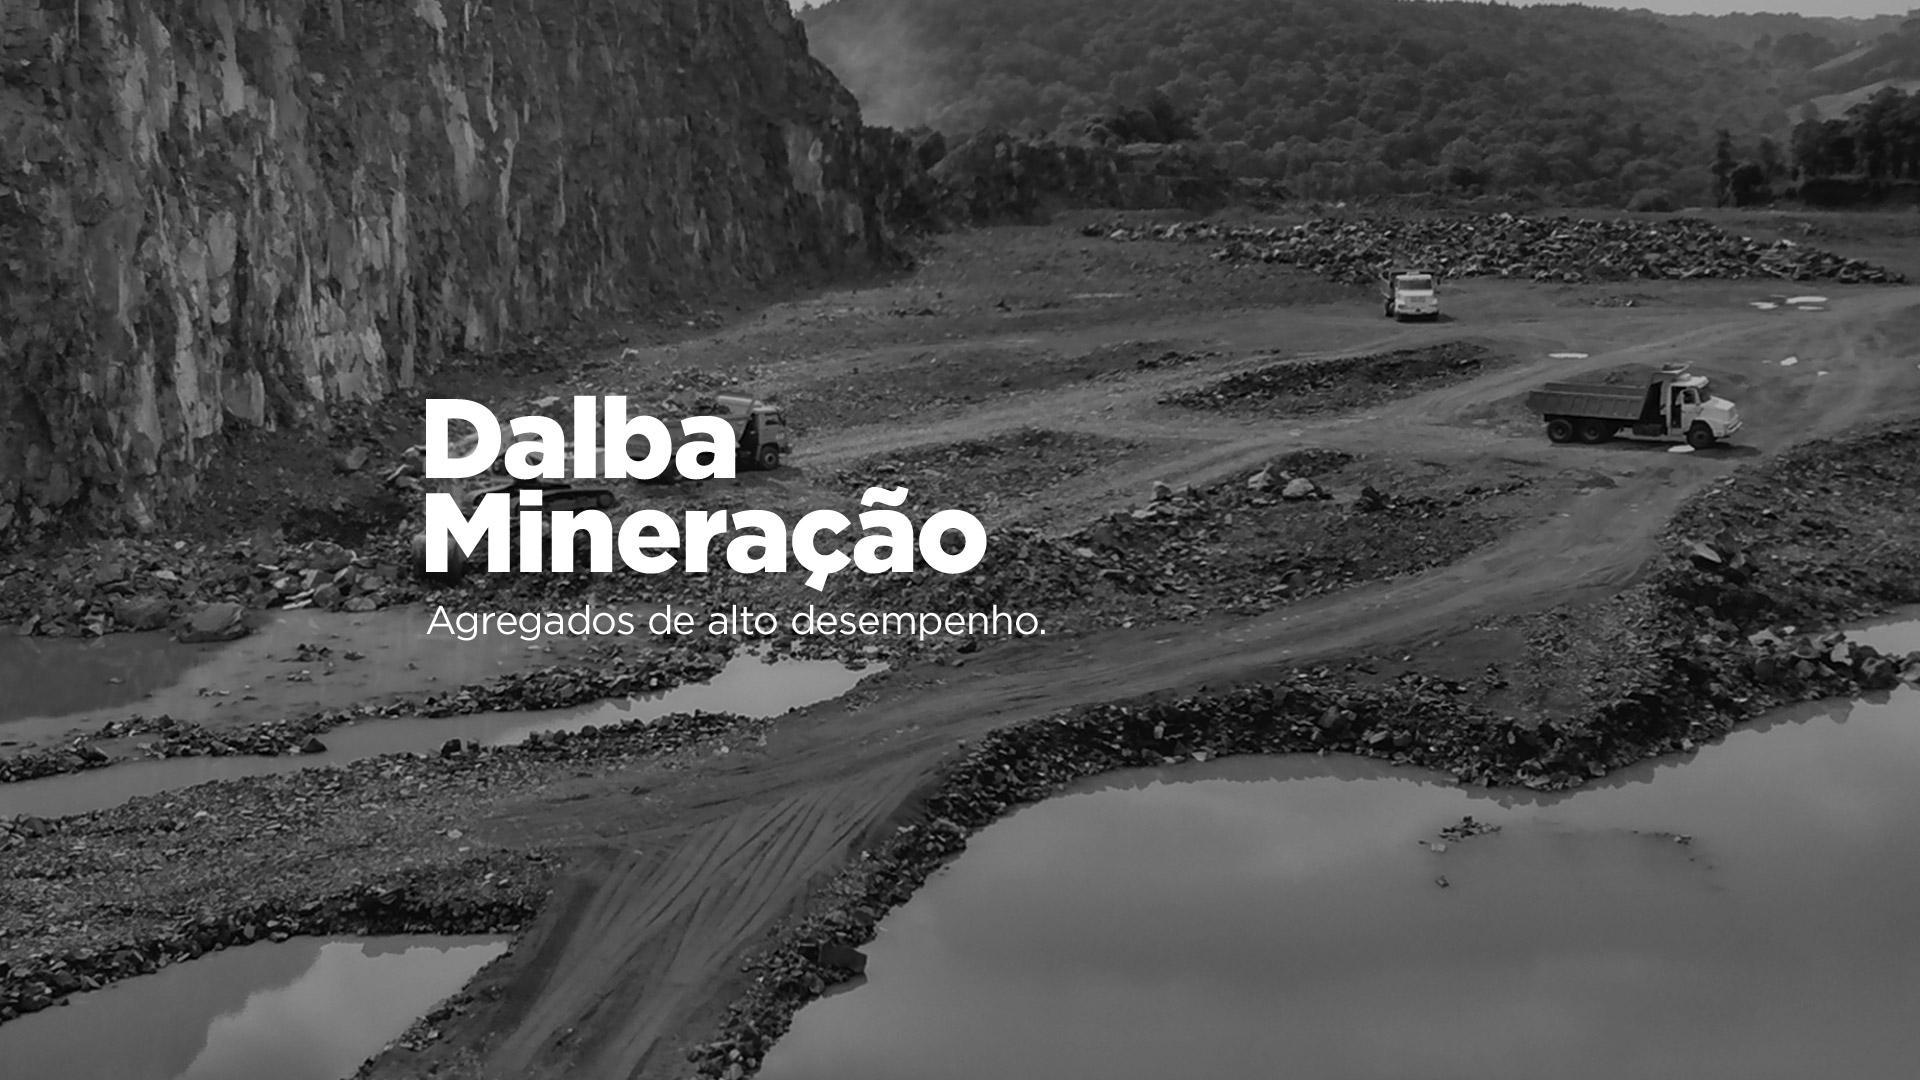 Dalba Mineração